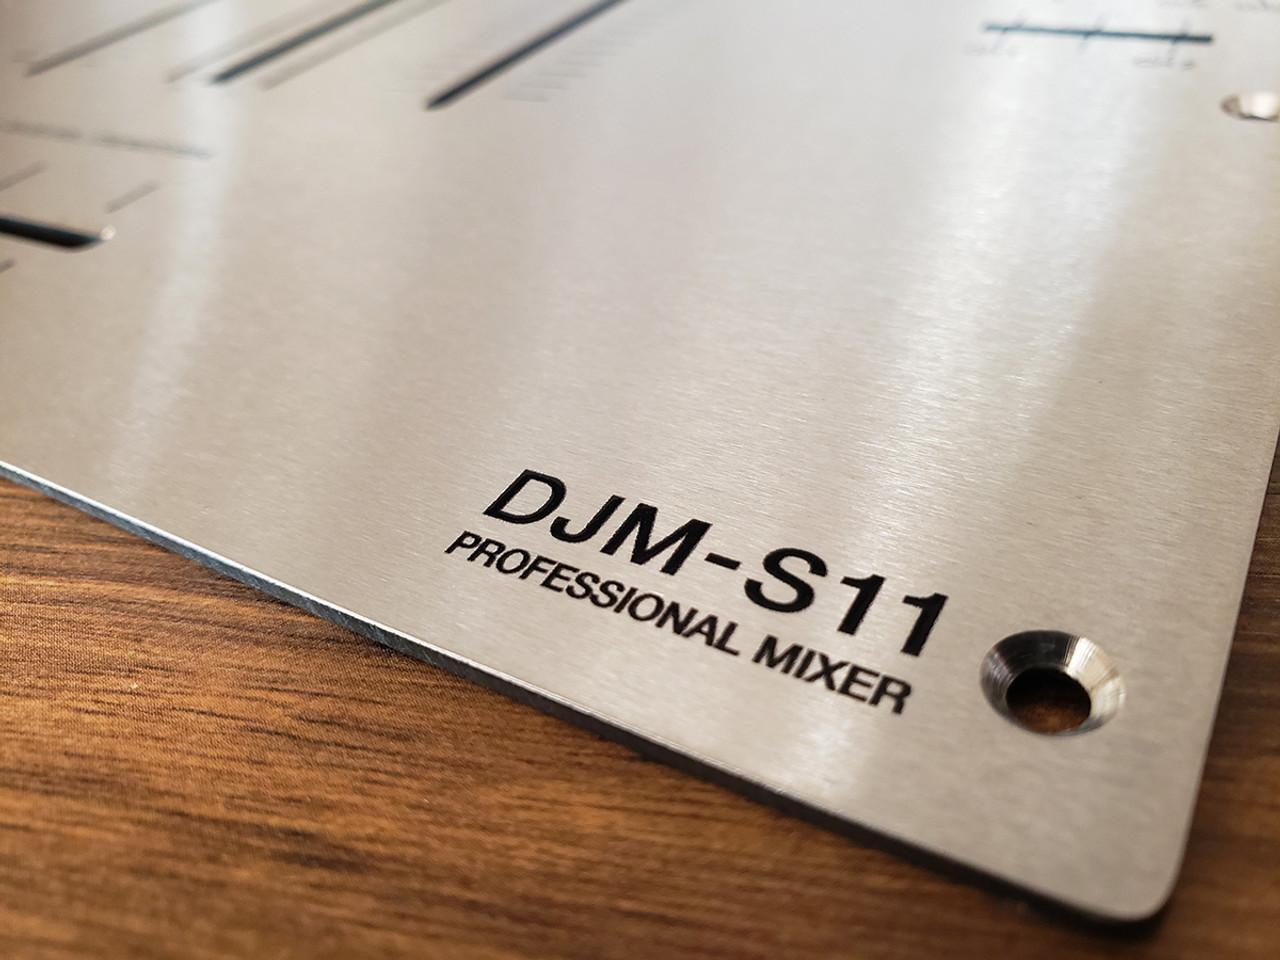 Pioneer DJM-S11 Stainless Steel Fader Plate